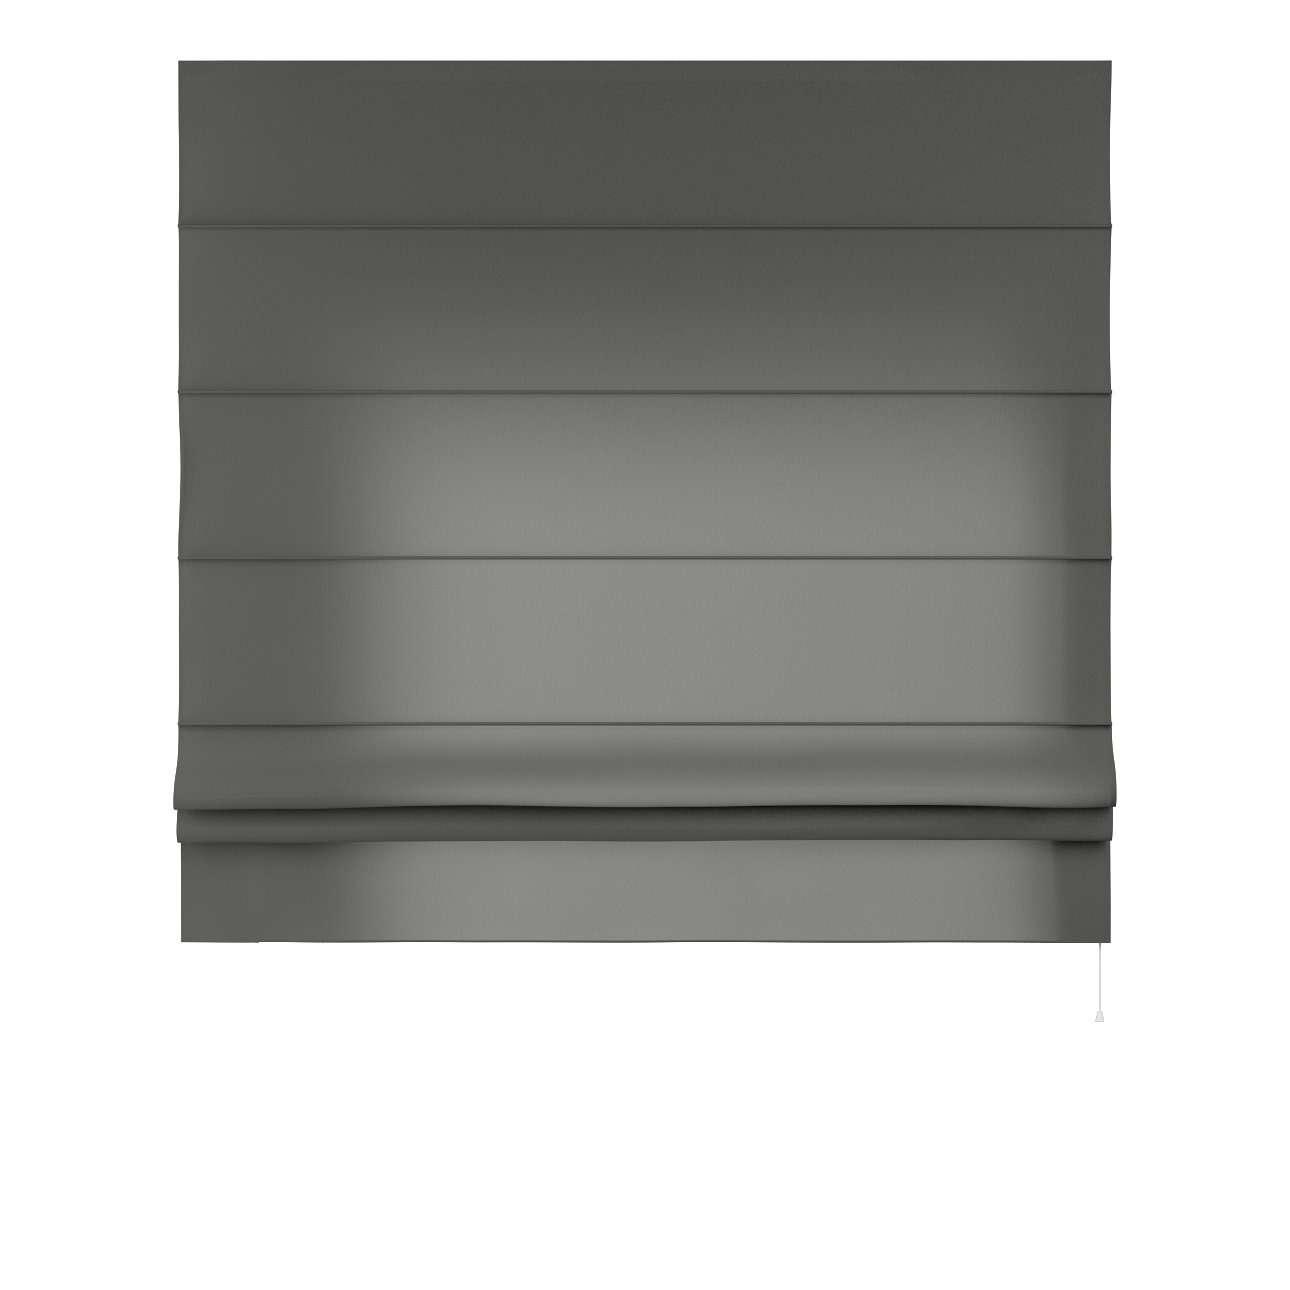 vouwgordijn Padva 80 x 170 cm van de collectie Quadro, Stof: 136-14